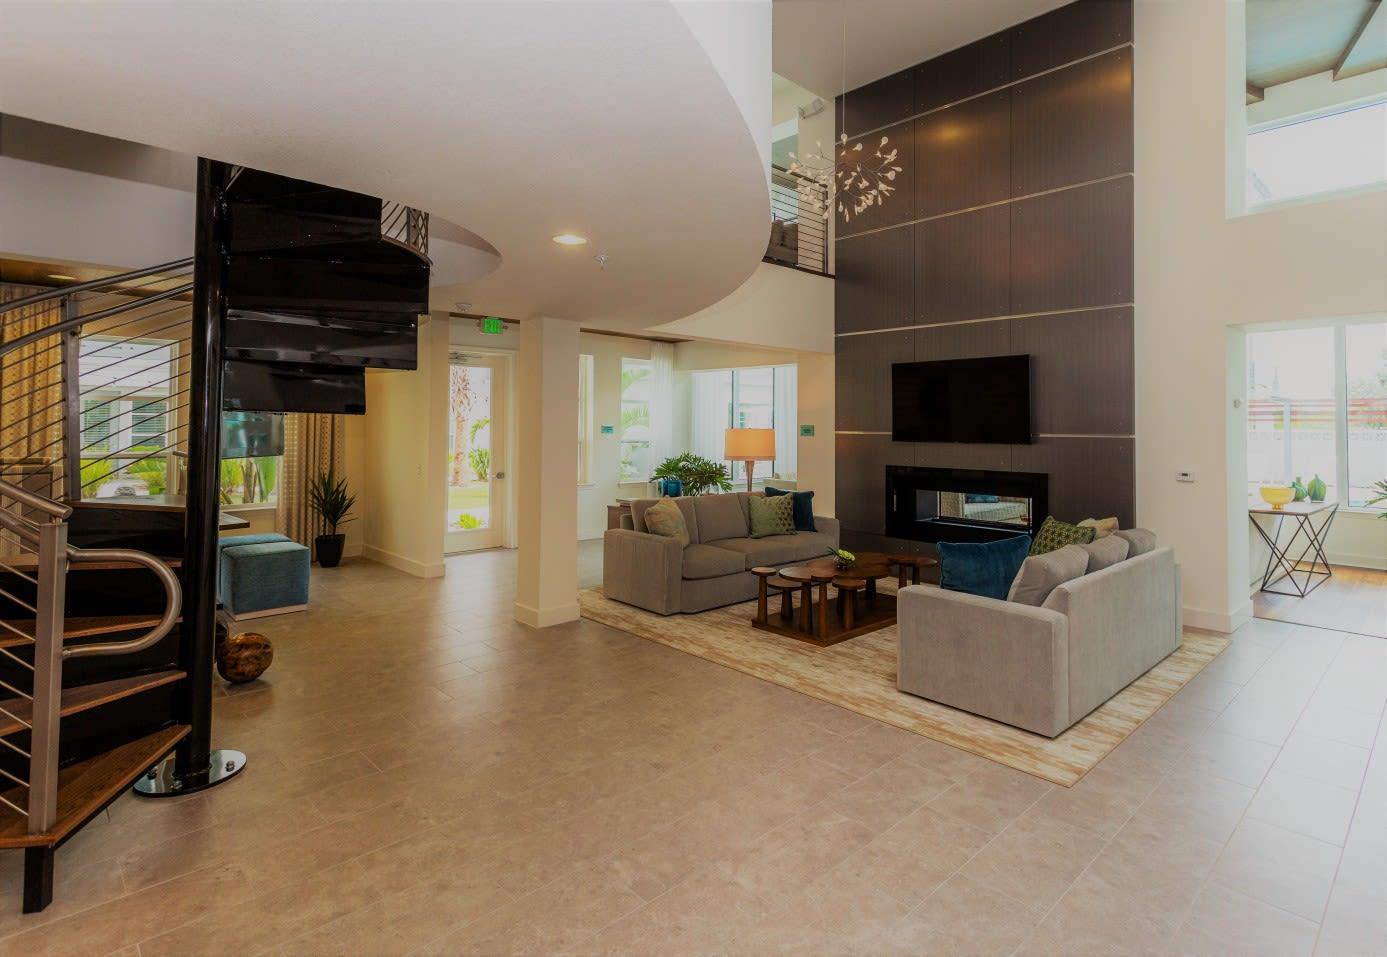 Lobby Area at 50 Paramount Apartments in Tampa Florida